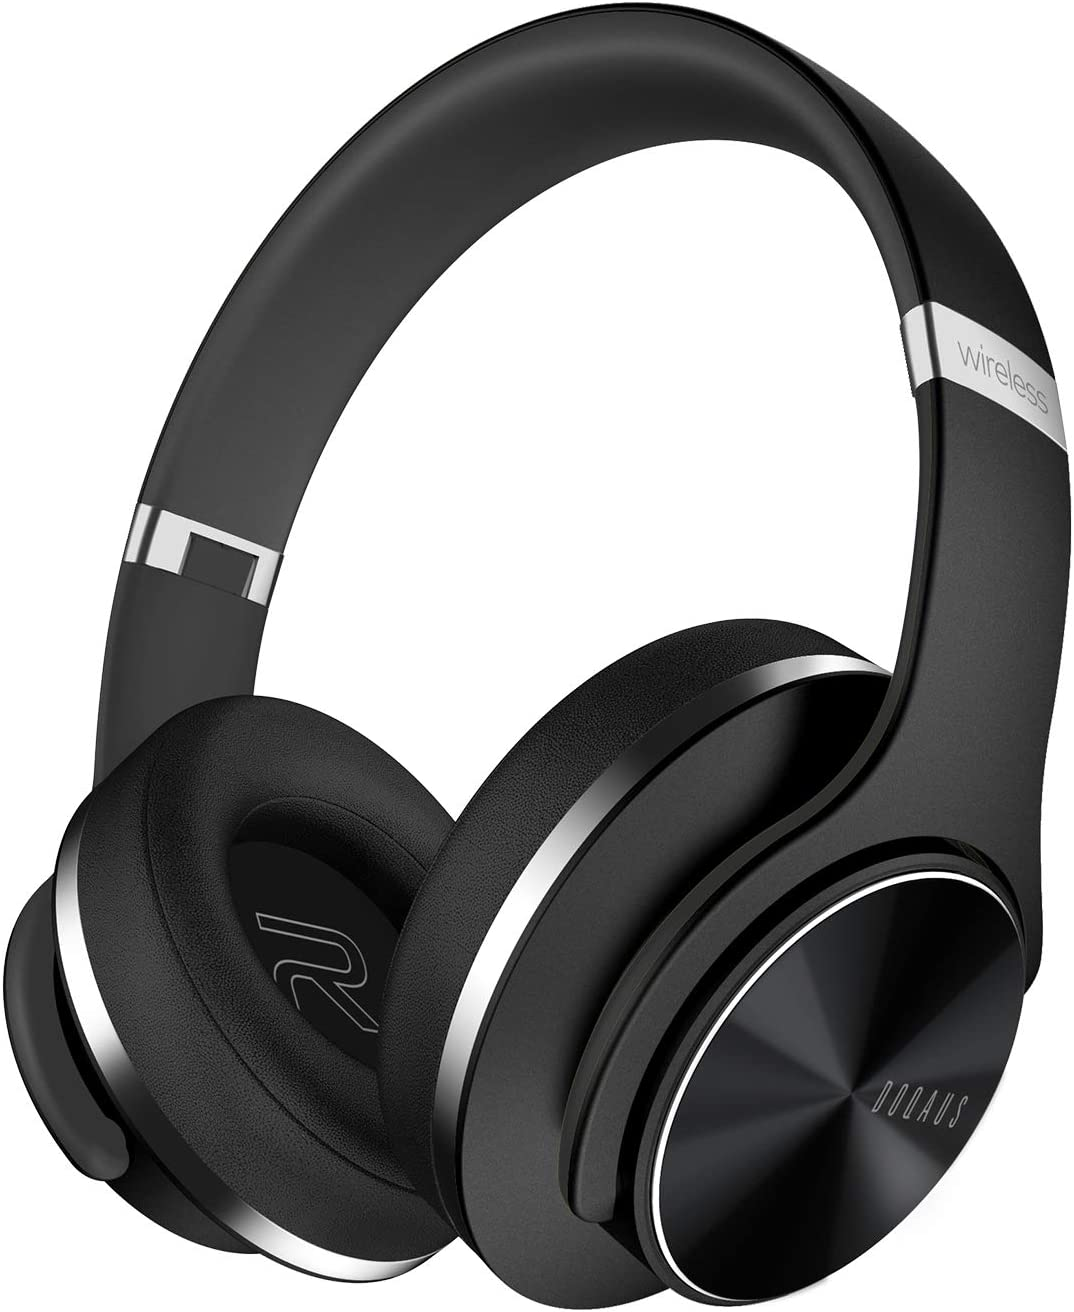 DOQAUS Cascos Bluetooth Diadema, 52 Hrs de Reproducir, con 3 Modo de EQ Cascos Bluetooth Inalambricos Plegable, orejeras proteína suaves, Micrófono Incorporado&Modo cableado, para TV/PC/Móviles(Negro)